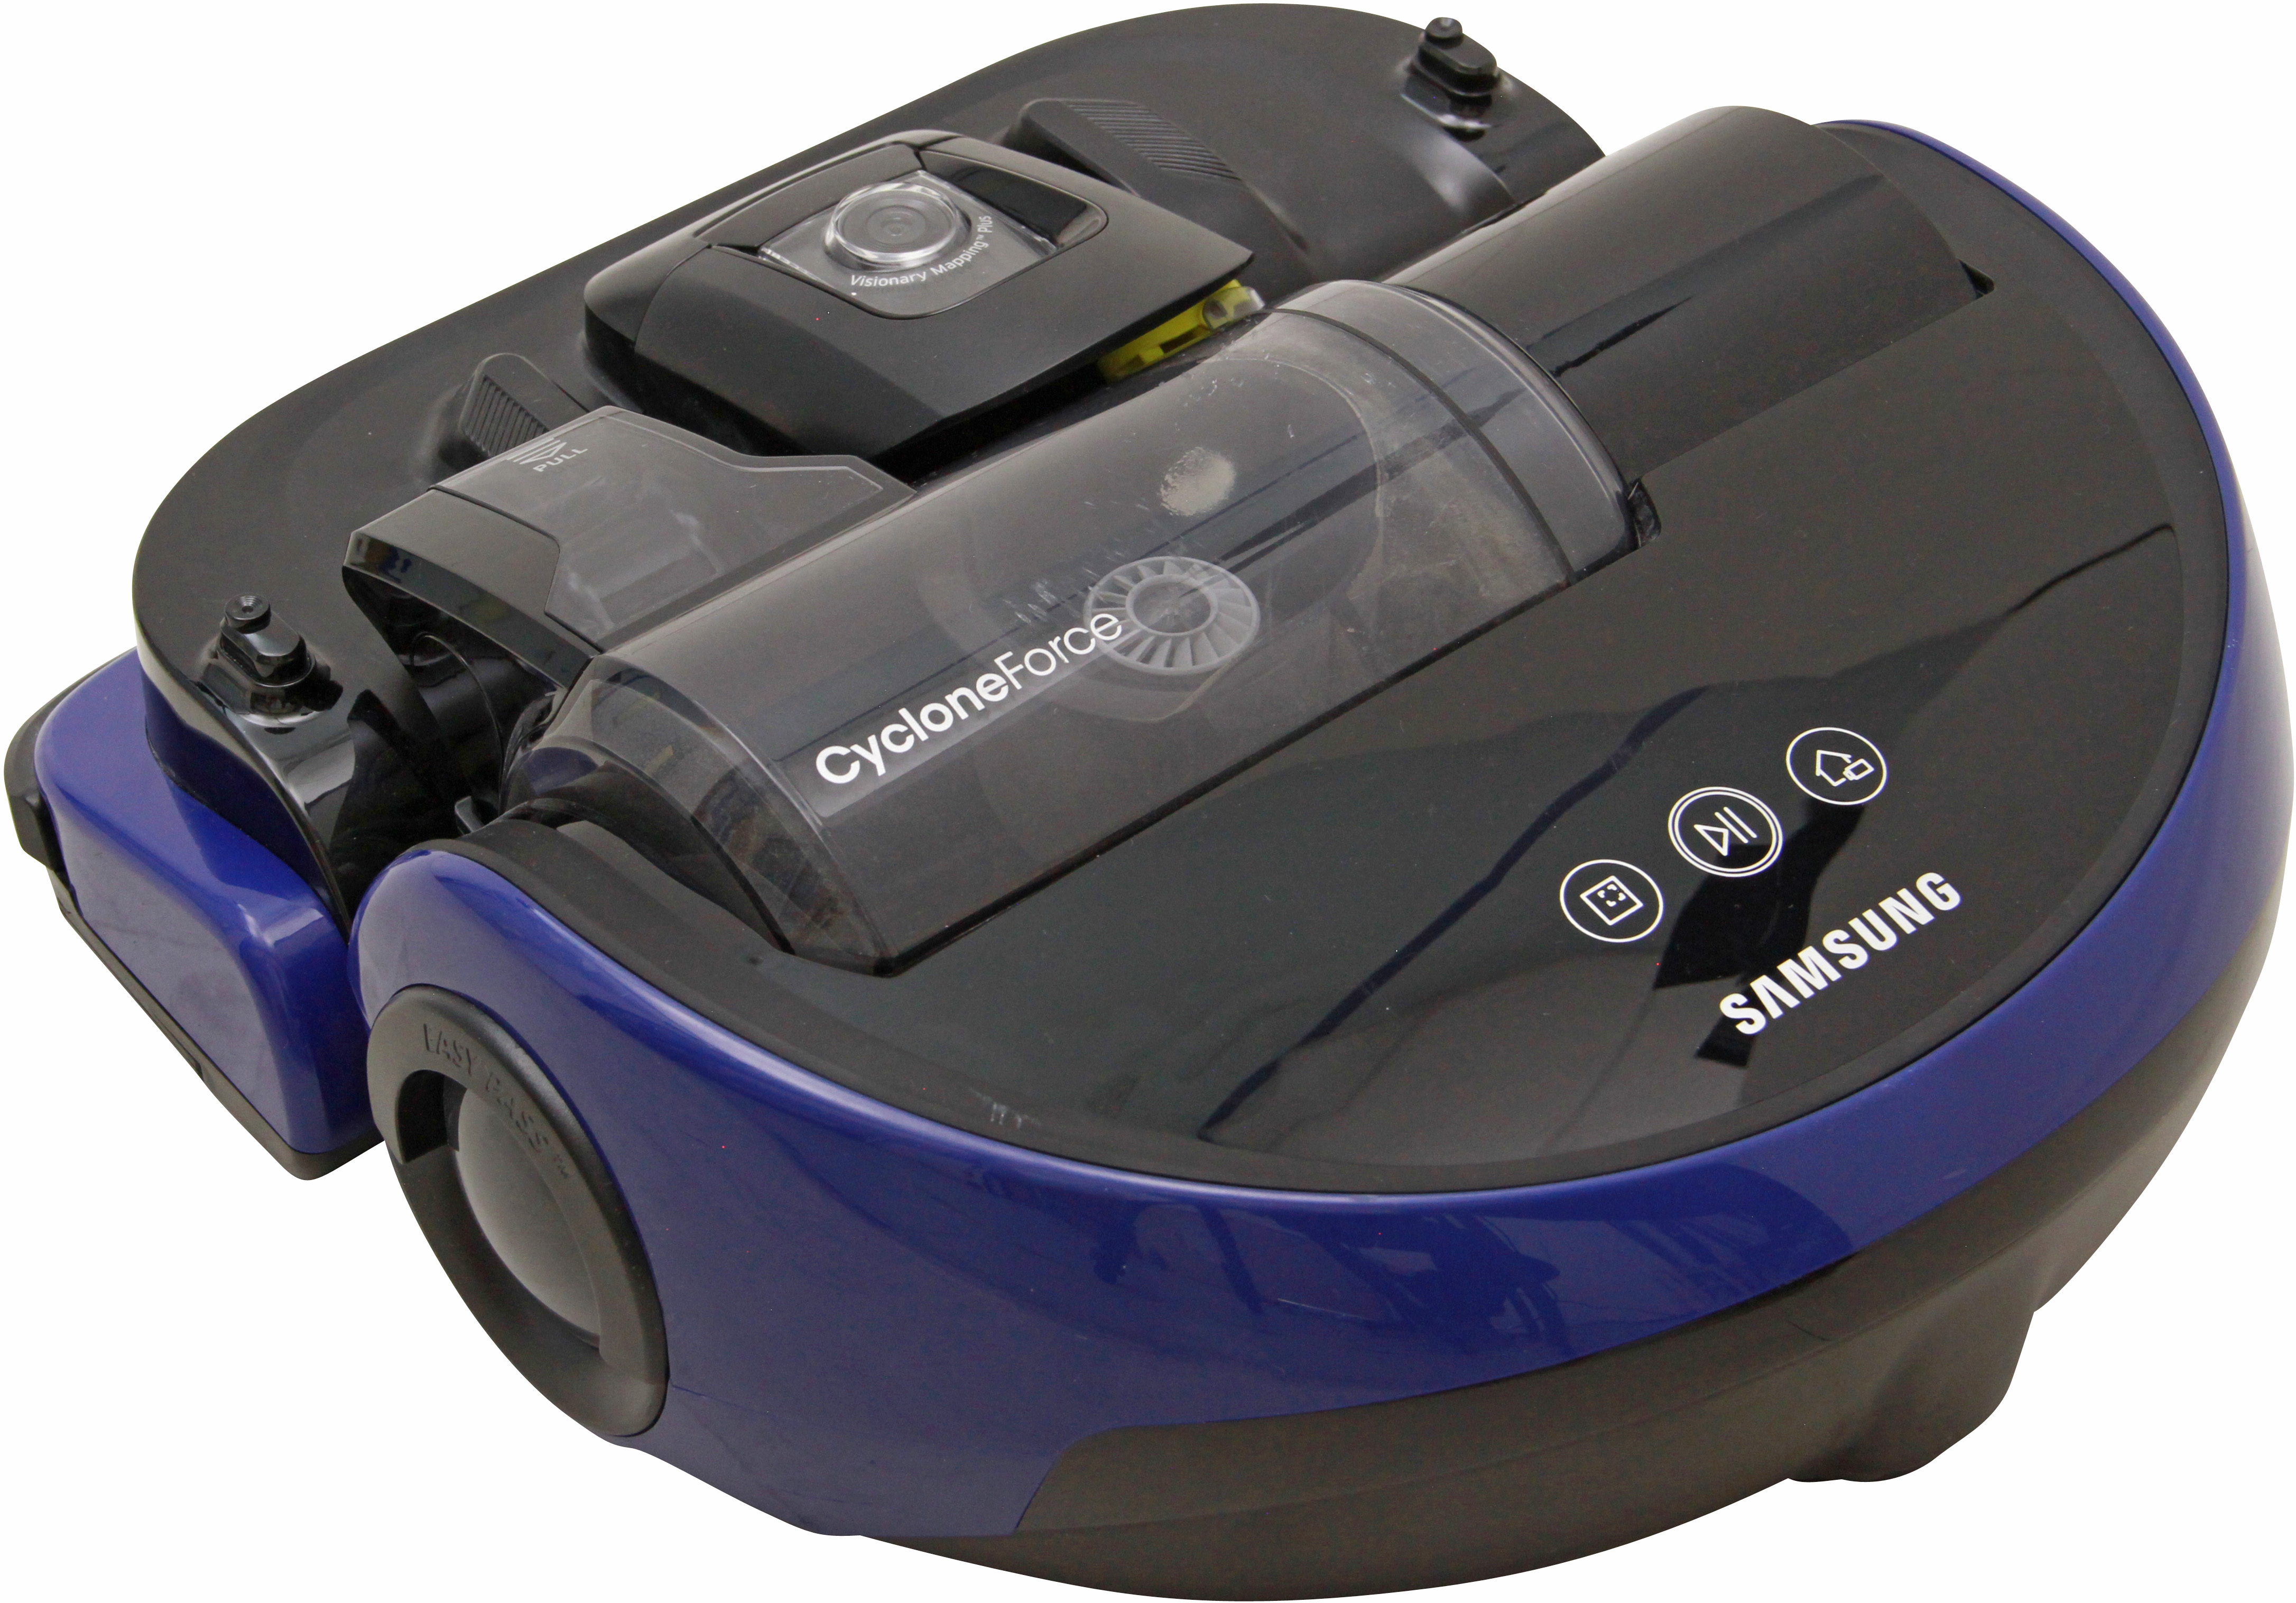 I dettagli del test sul robot aspirapolvere samsung vr20k9000ub - Robot aspirapolvere folletto prezzo ...